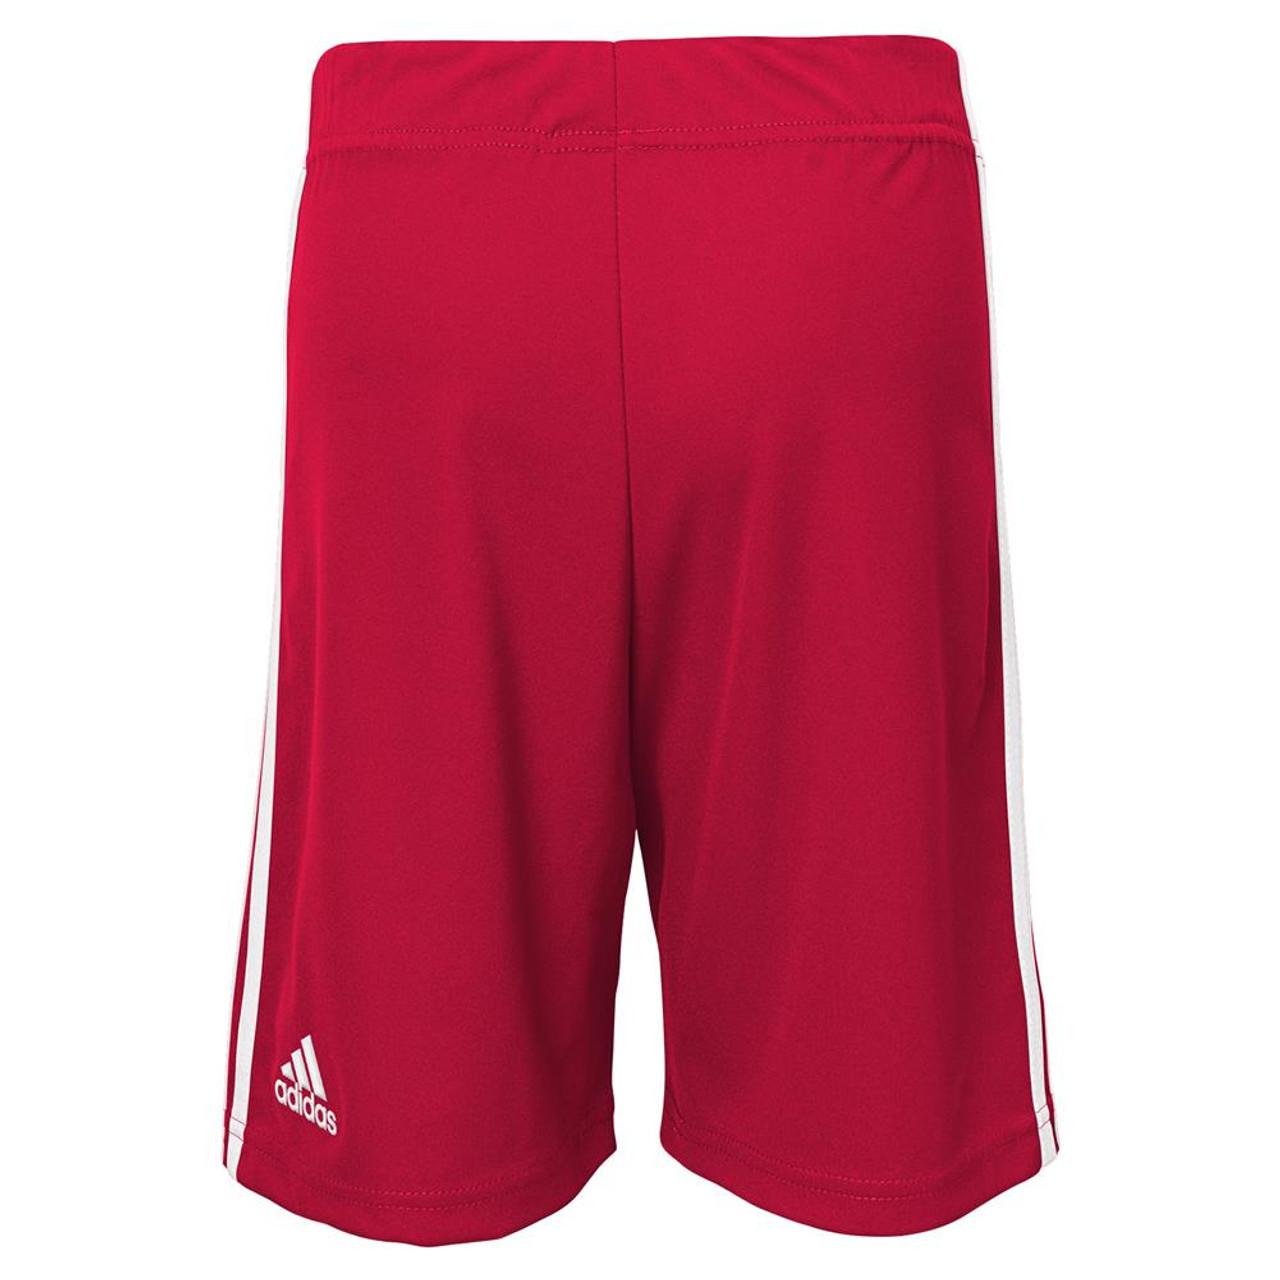 Boy's New York Red Bulls Gym Shorts Adidas Basketball Shorts